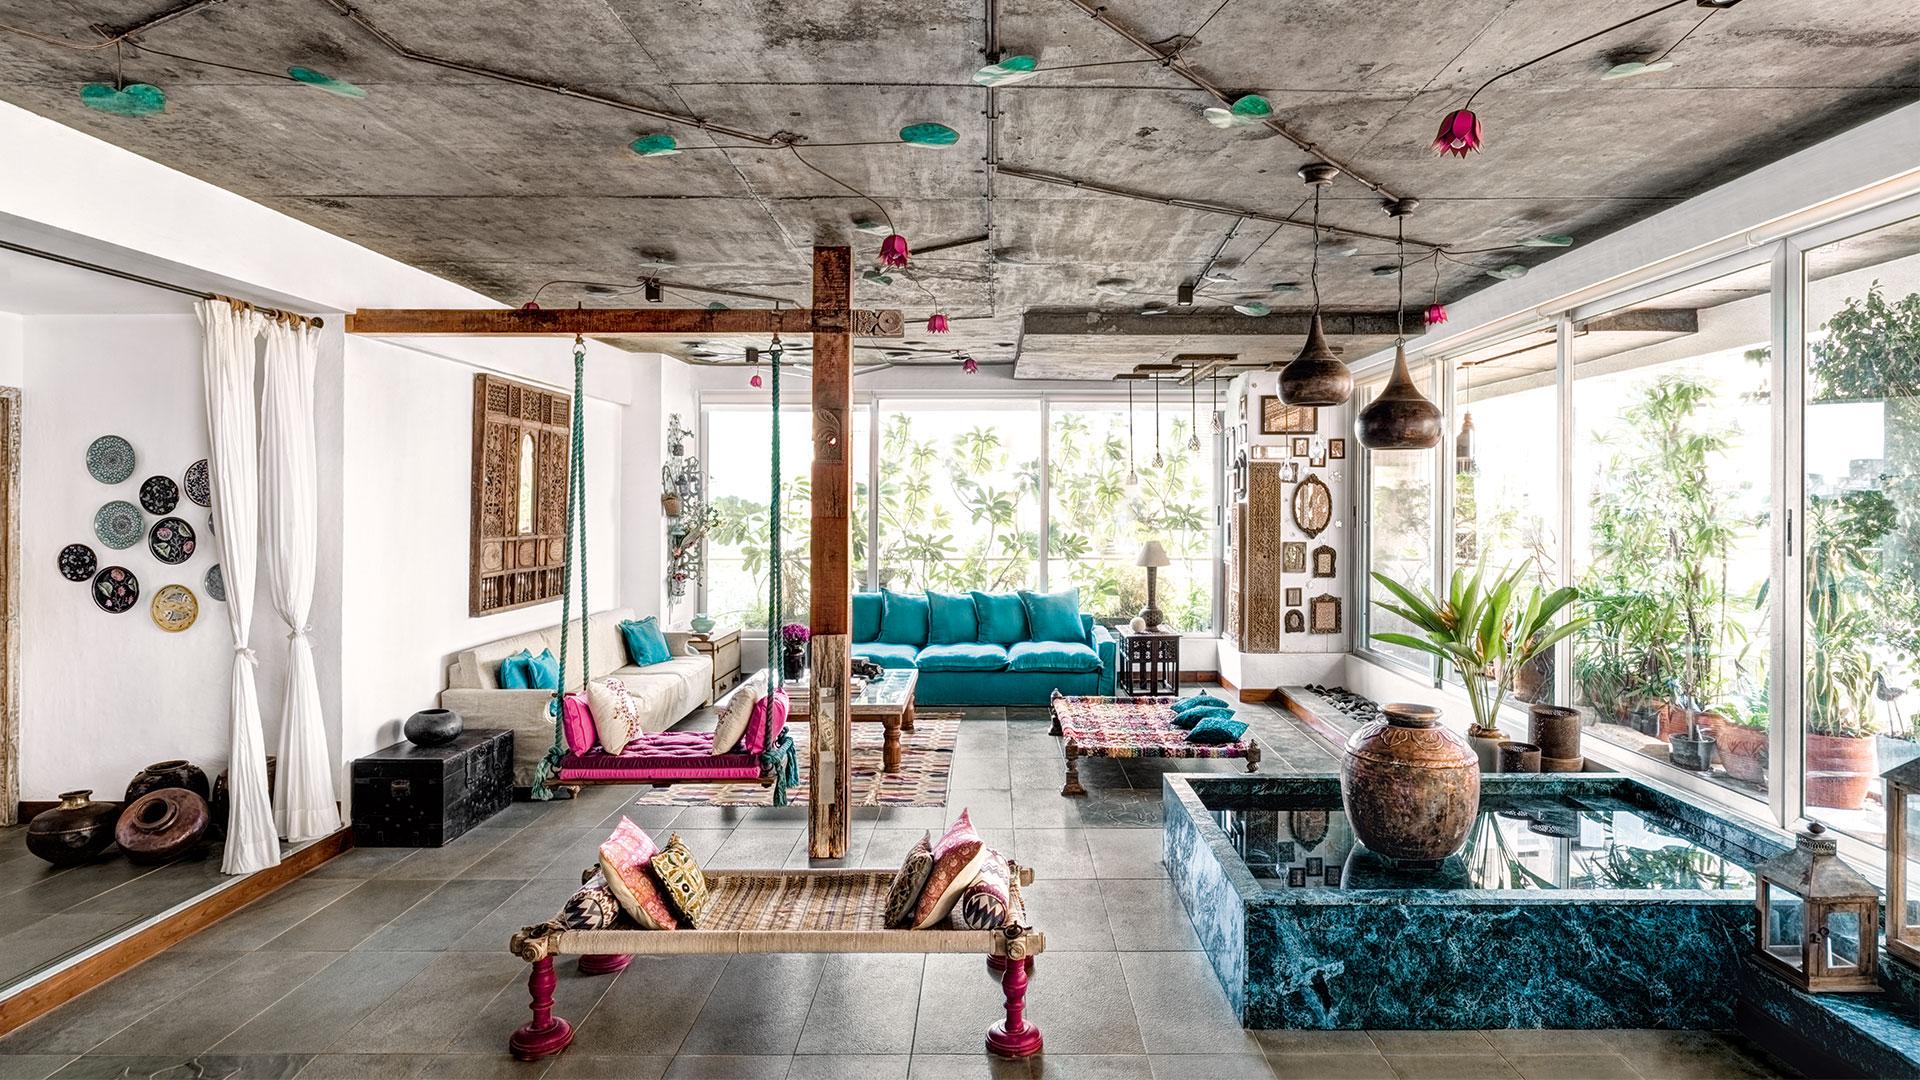 Irrfan Khan Home interiors (4).jpg